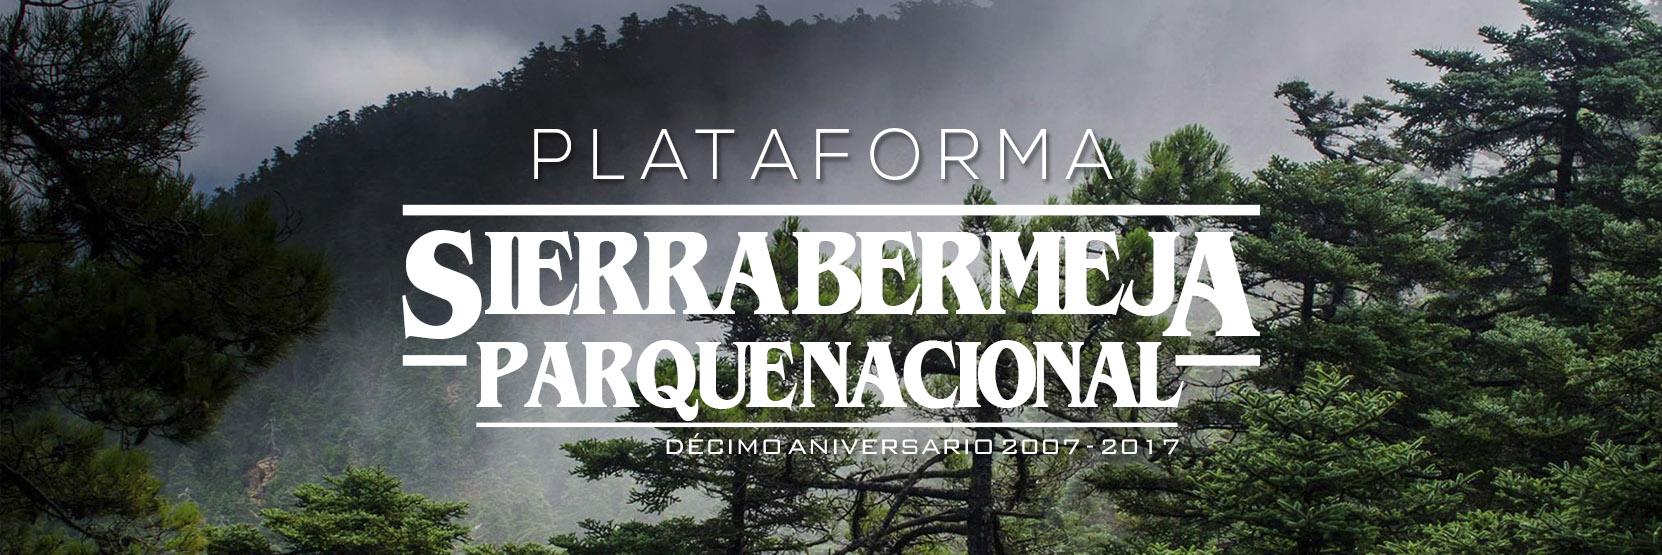 Plataforma Sierra Bermeja Parque Nacional - X Aniversario